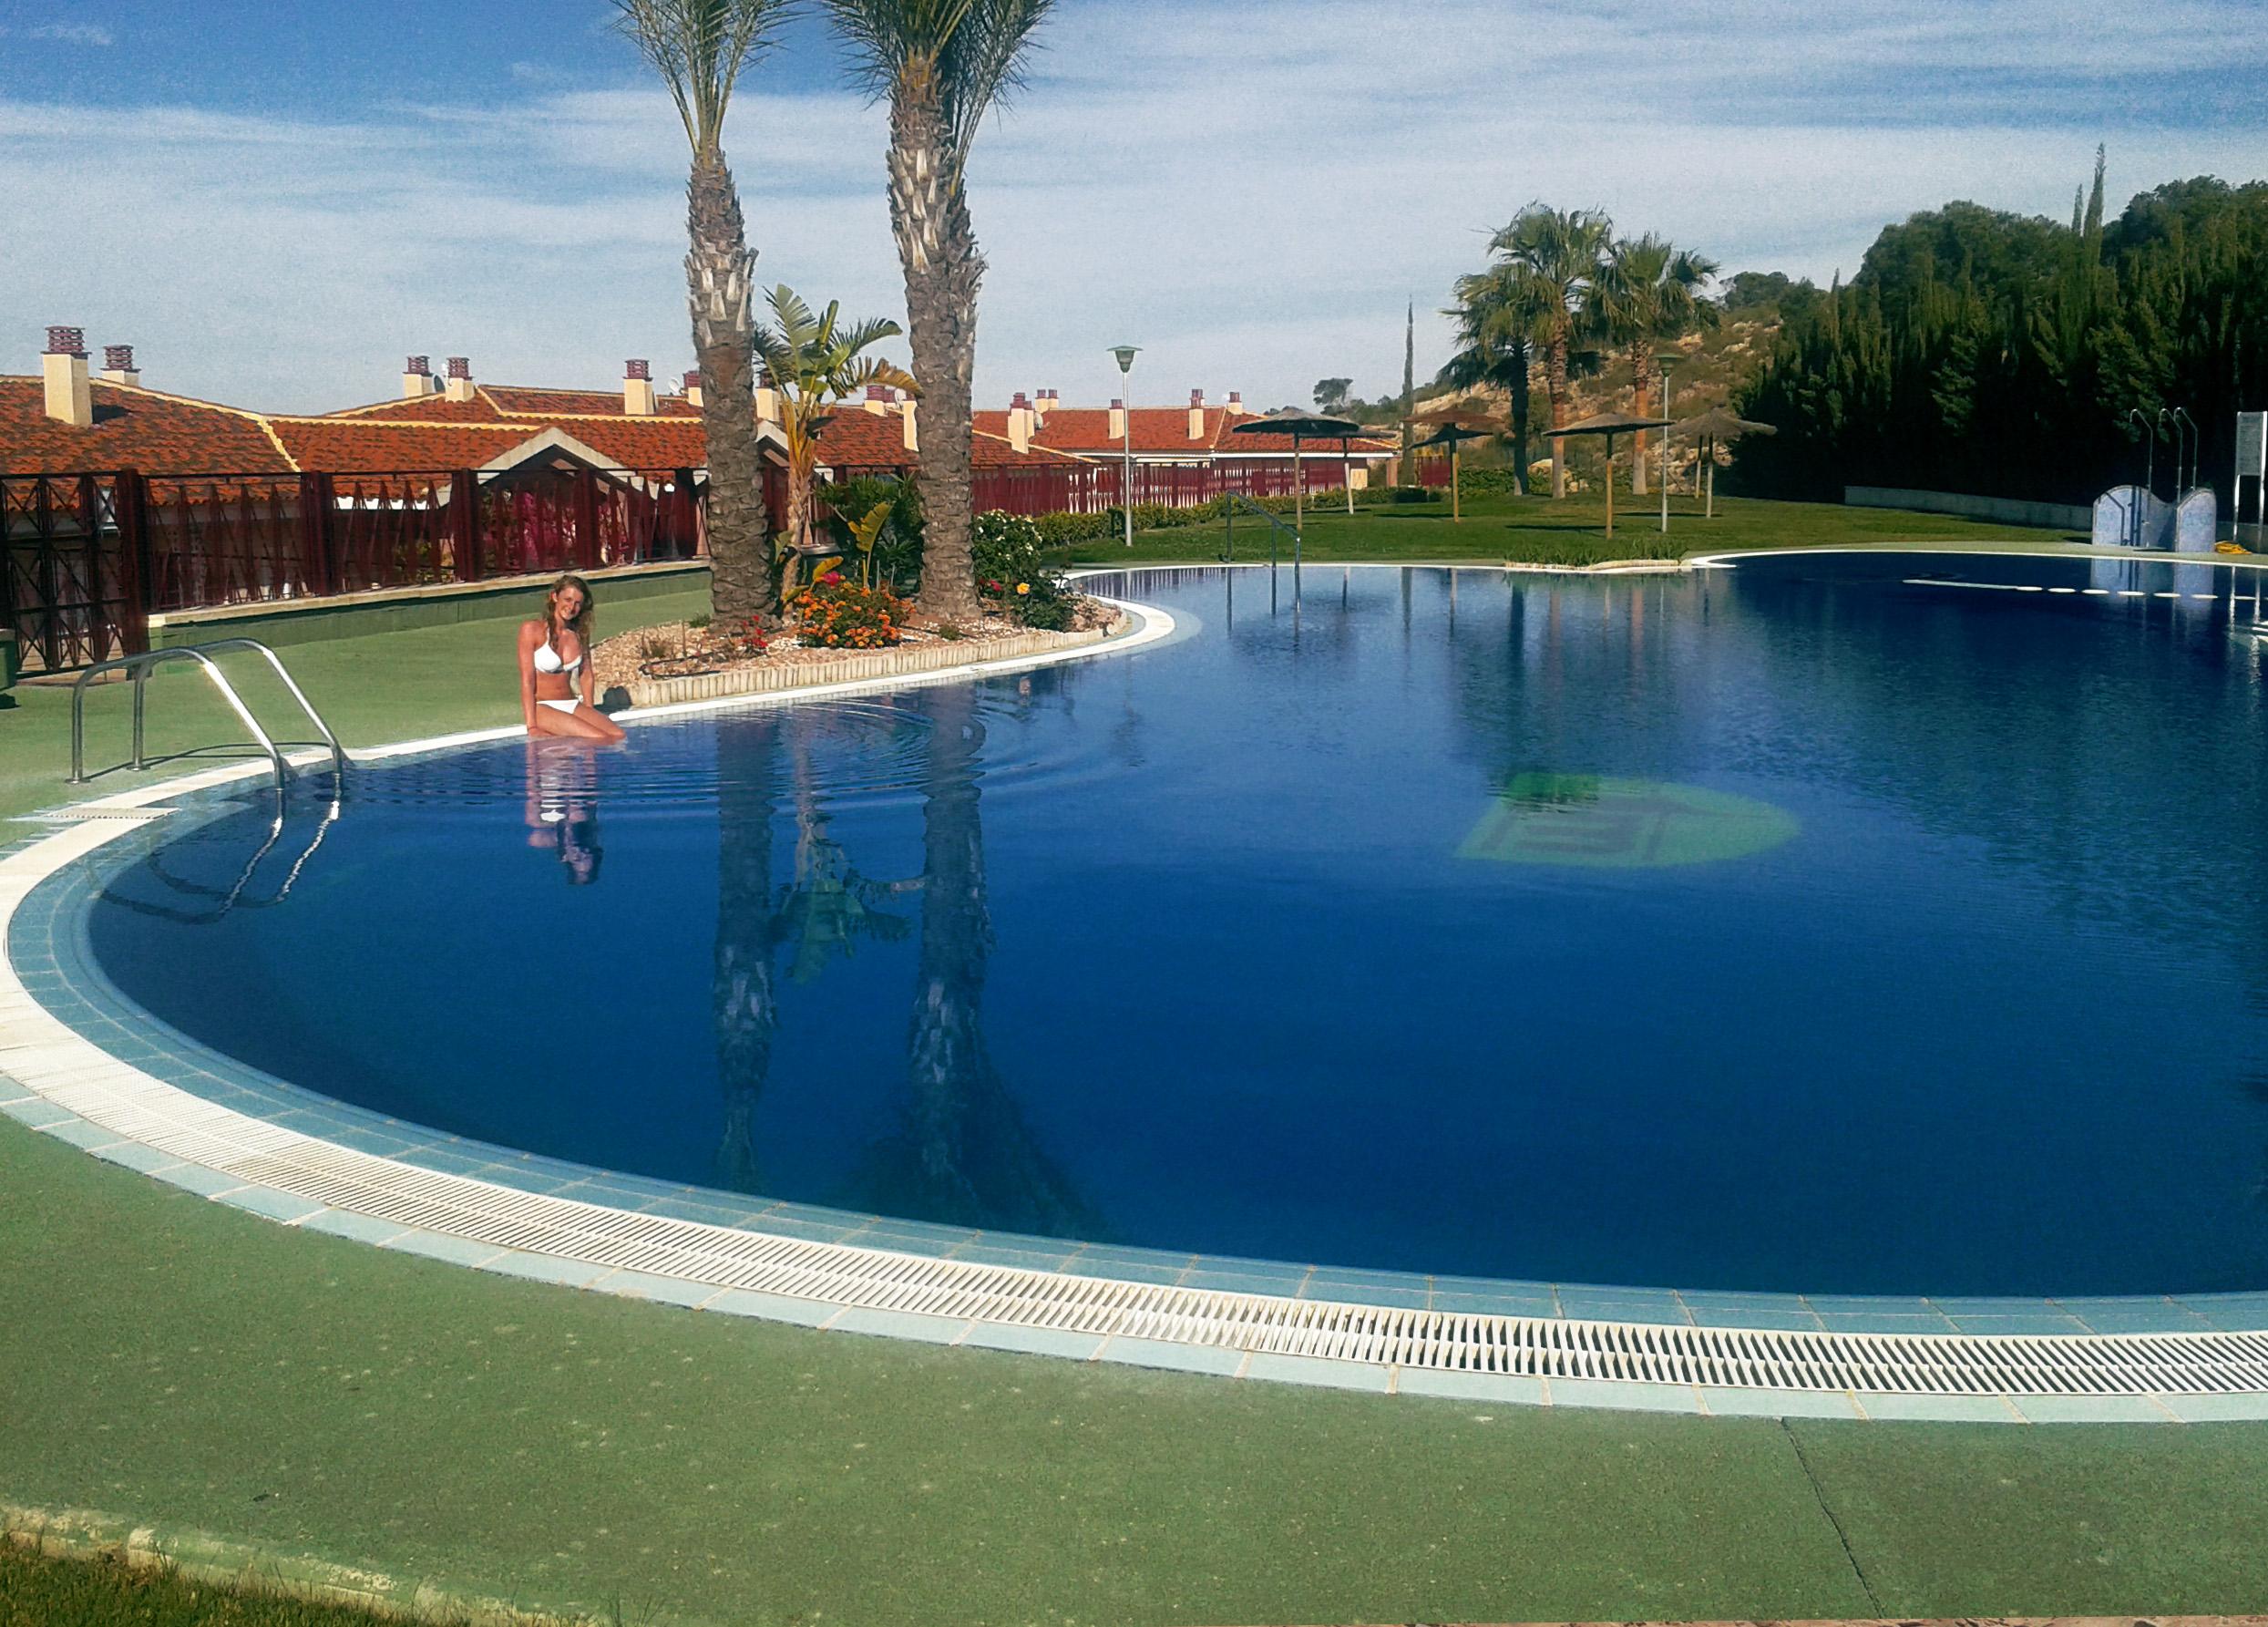 Attraktioner Badeferie I Spanien